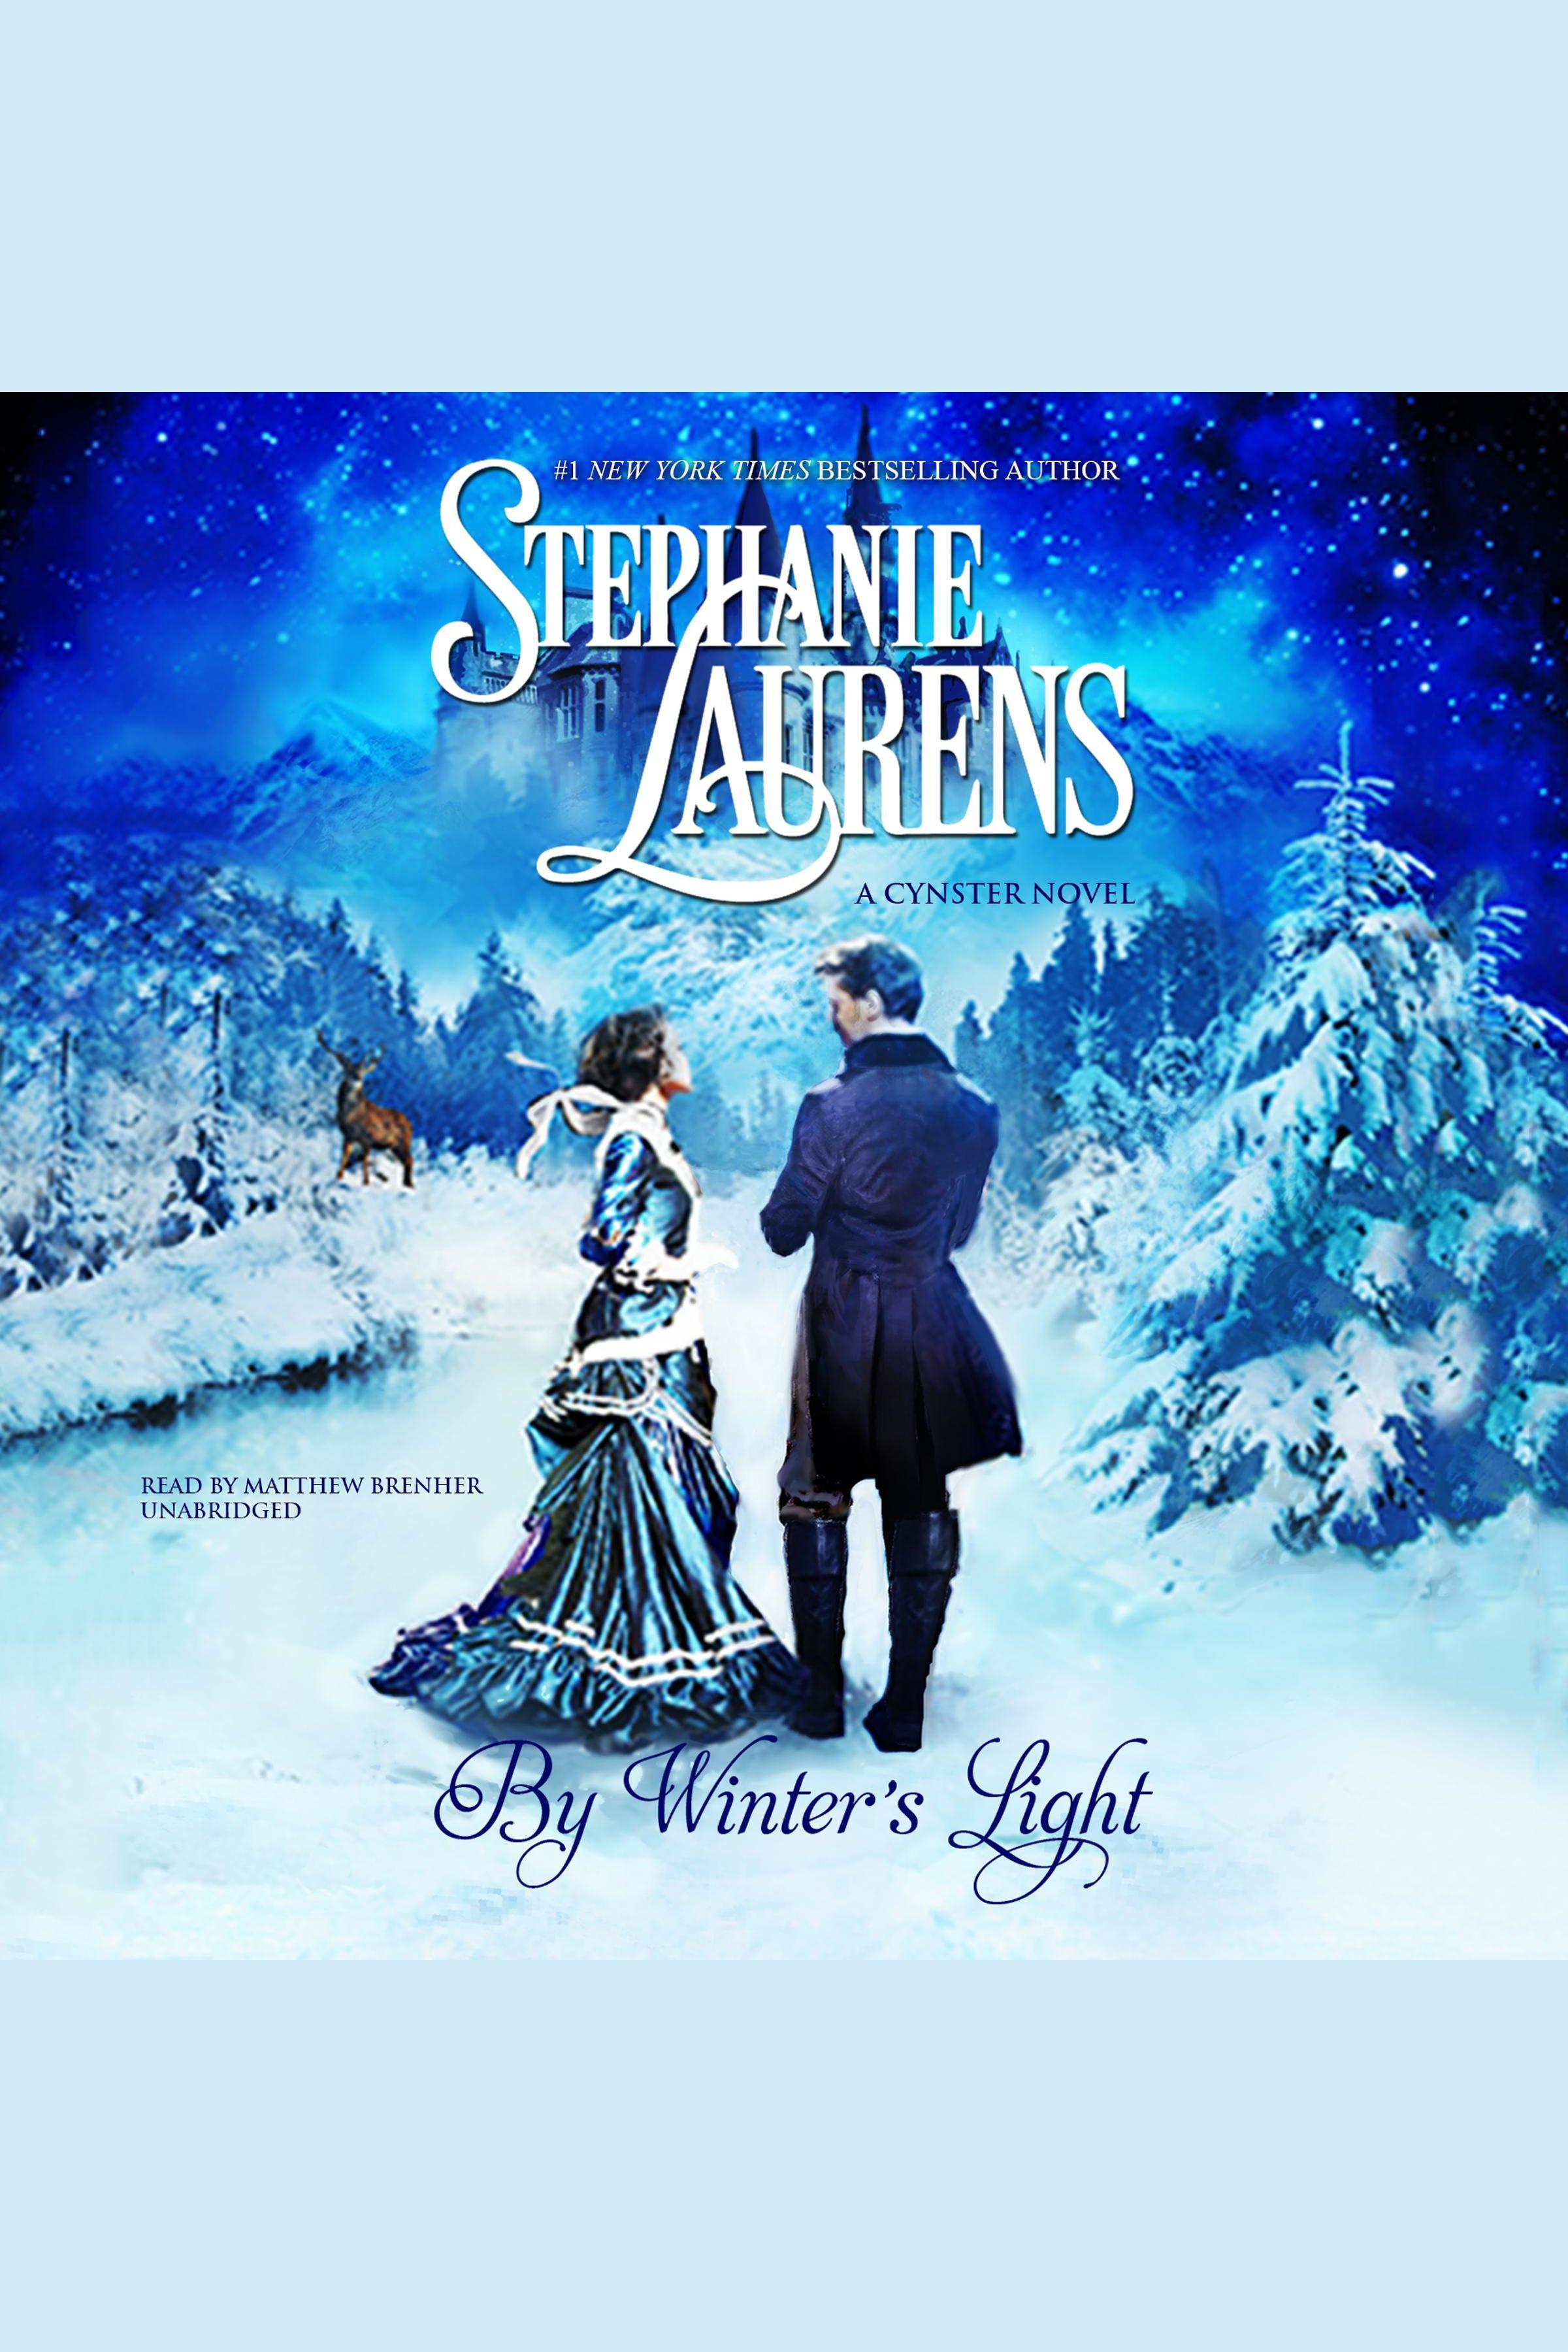 By Winter's Light A Cynster Novel